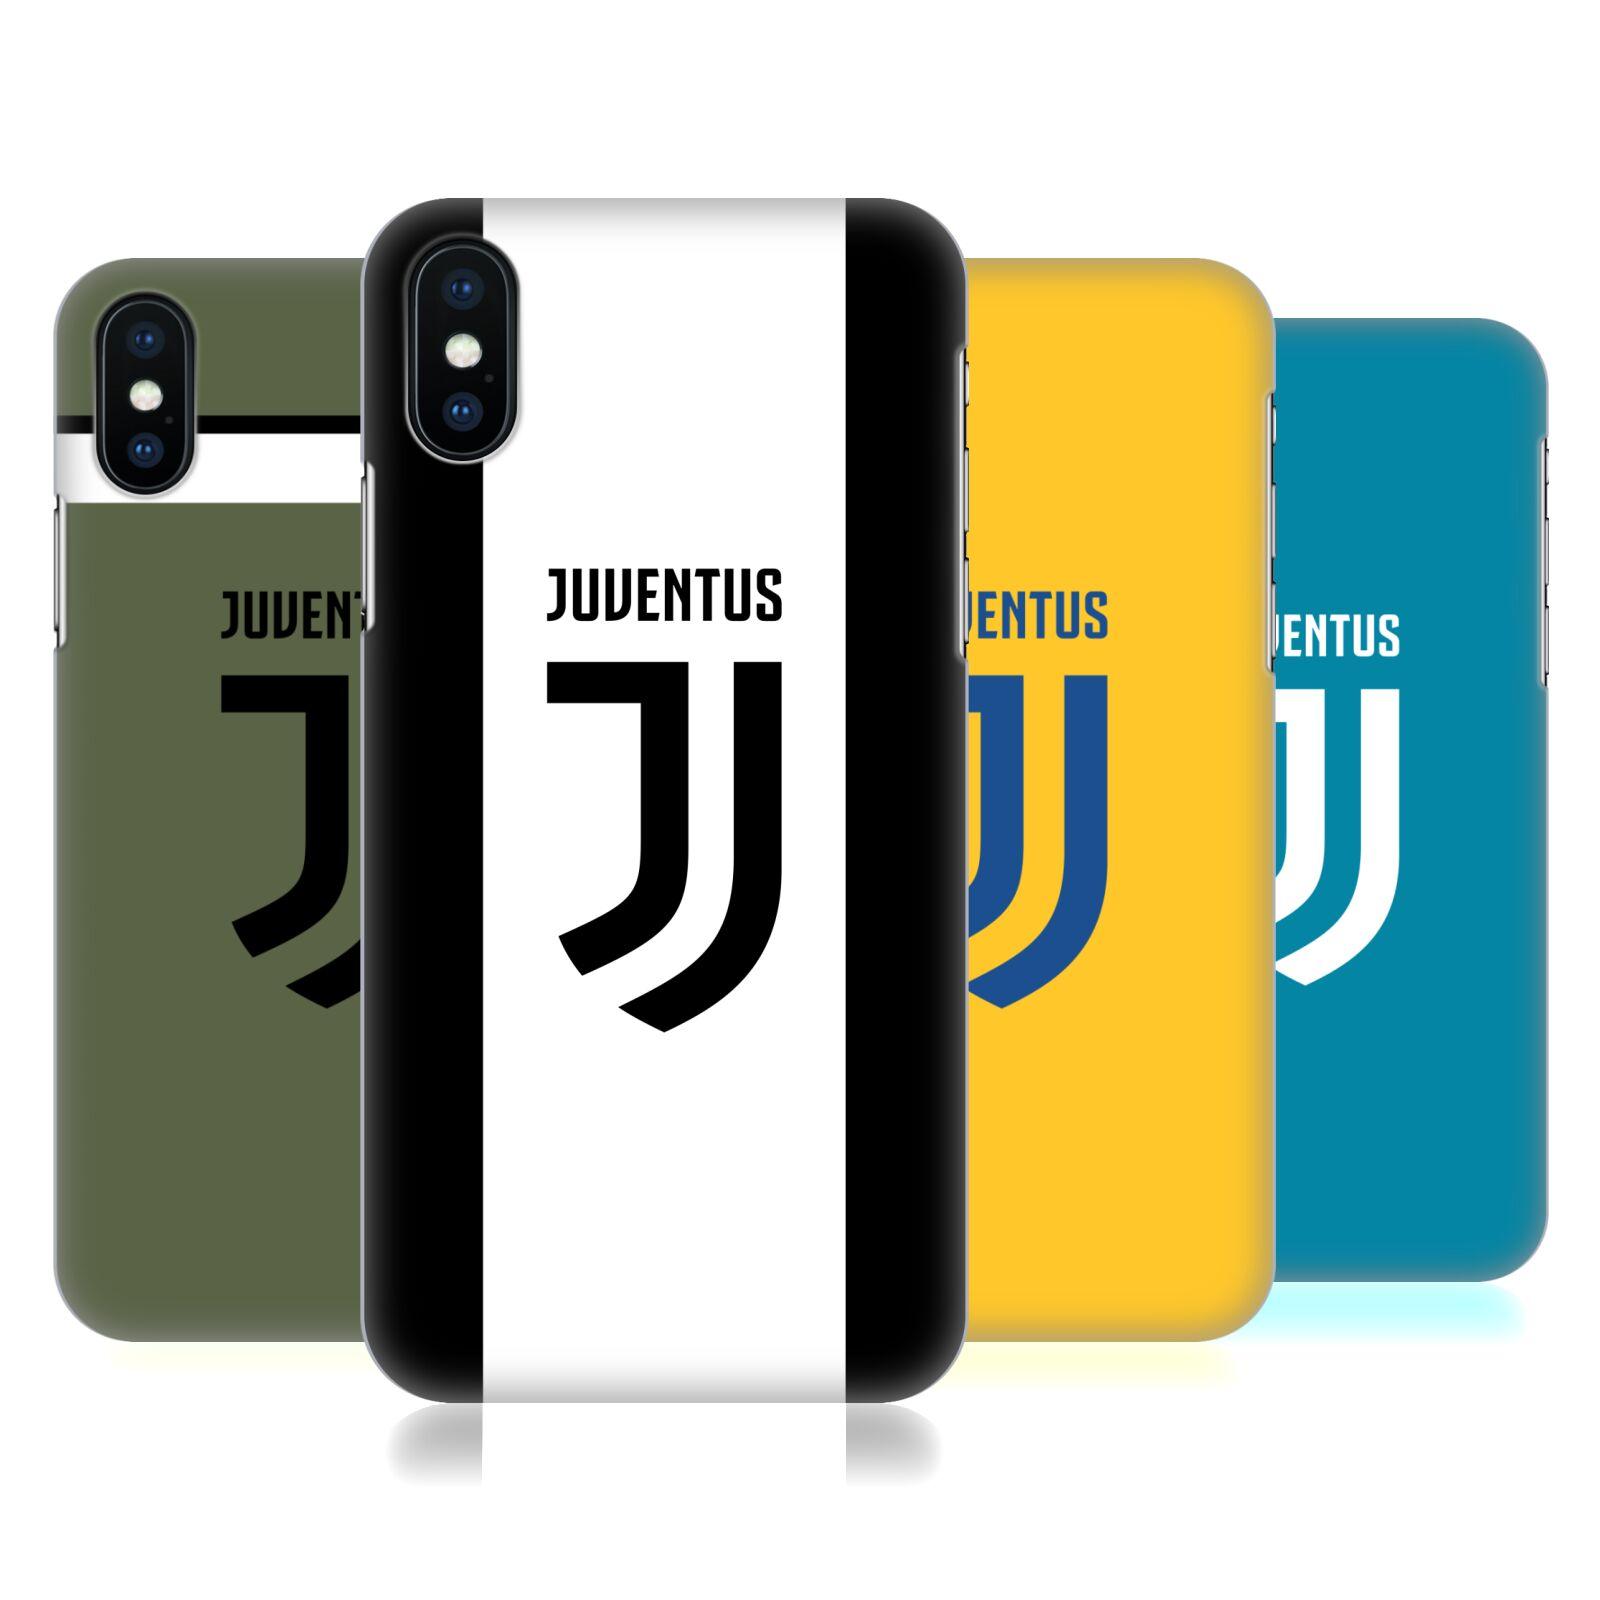 Juventus Football Club 2017/18 Race Kit